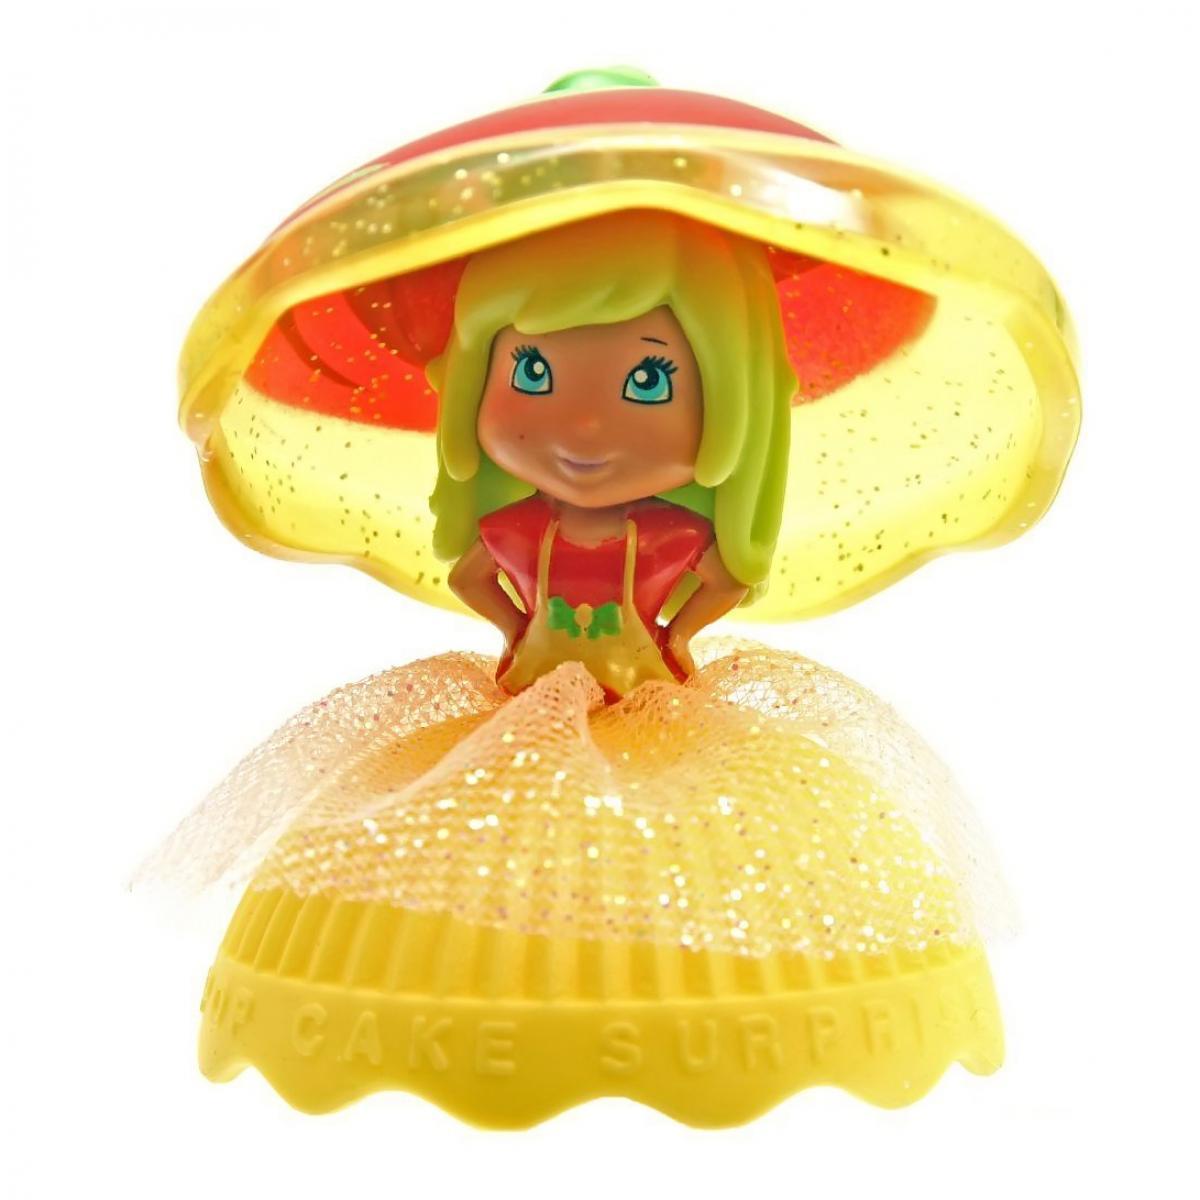 Объемная попа у куклы